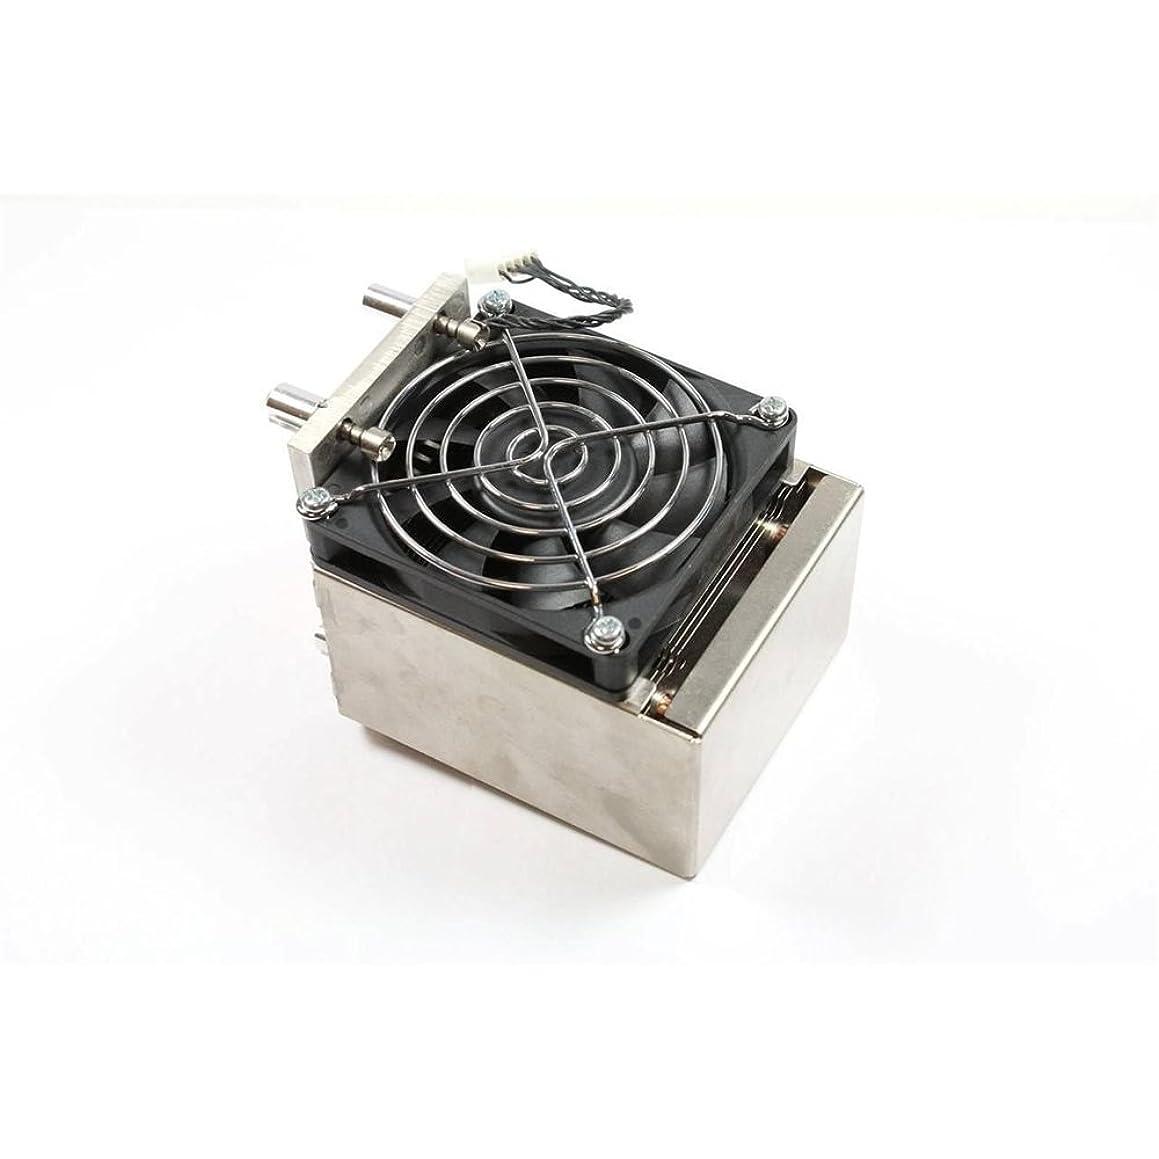 HP Workststion xw6400 xw8400 CPU Heatsink with Fan 398293-001 398293-003